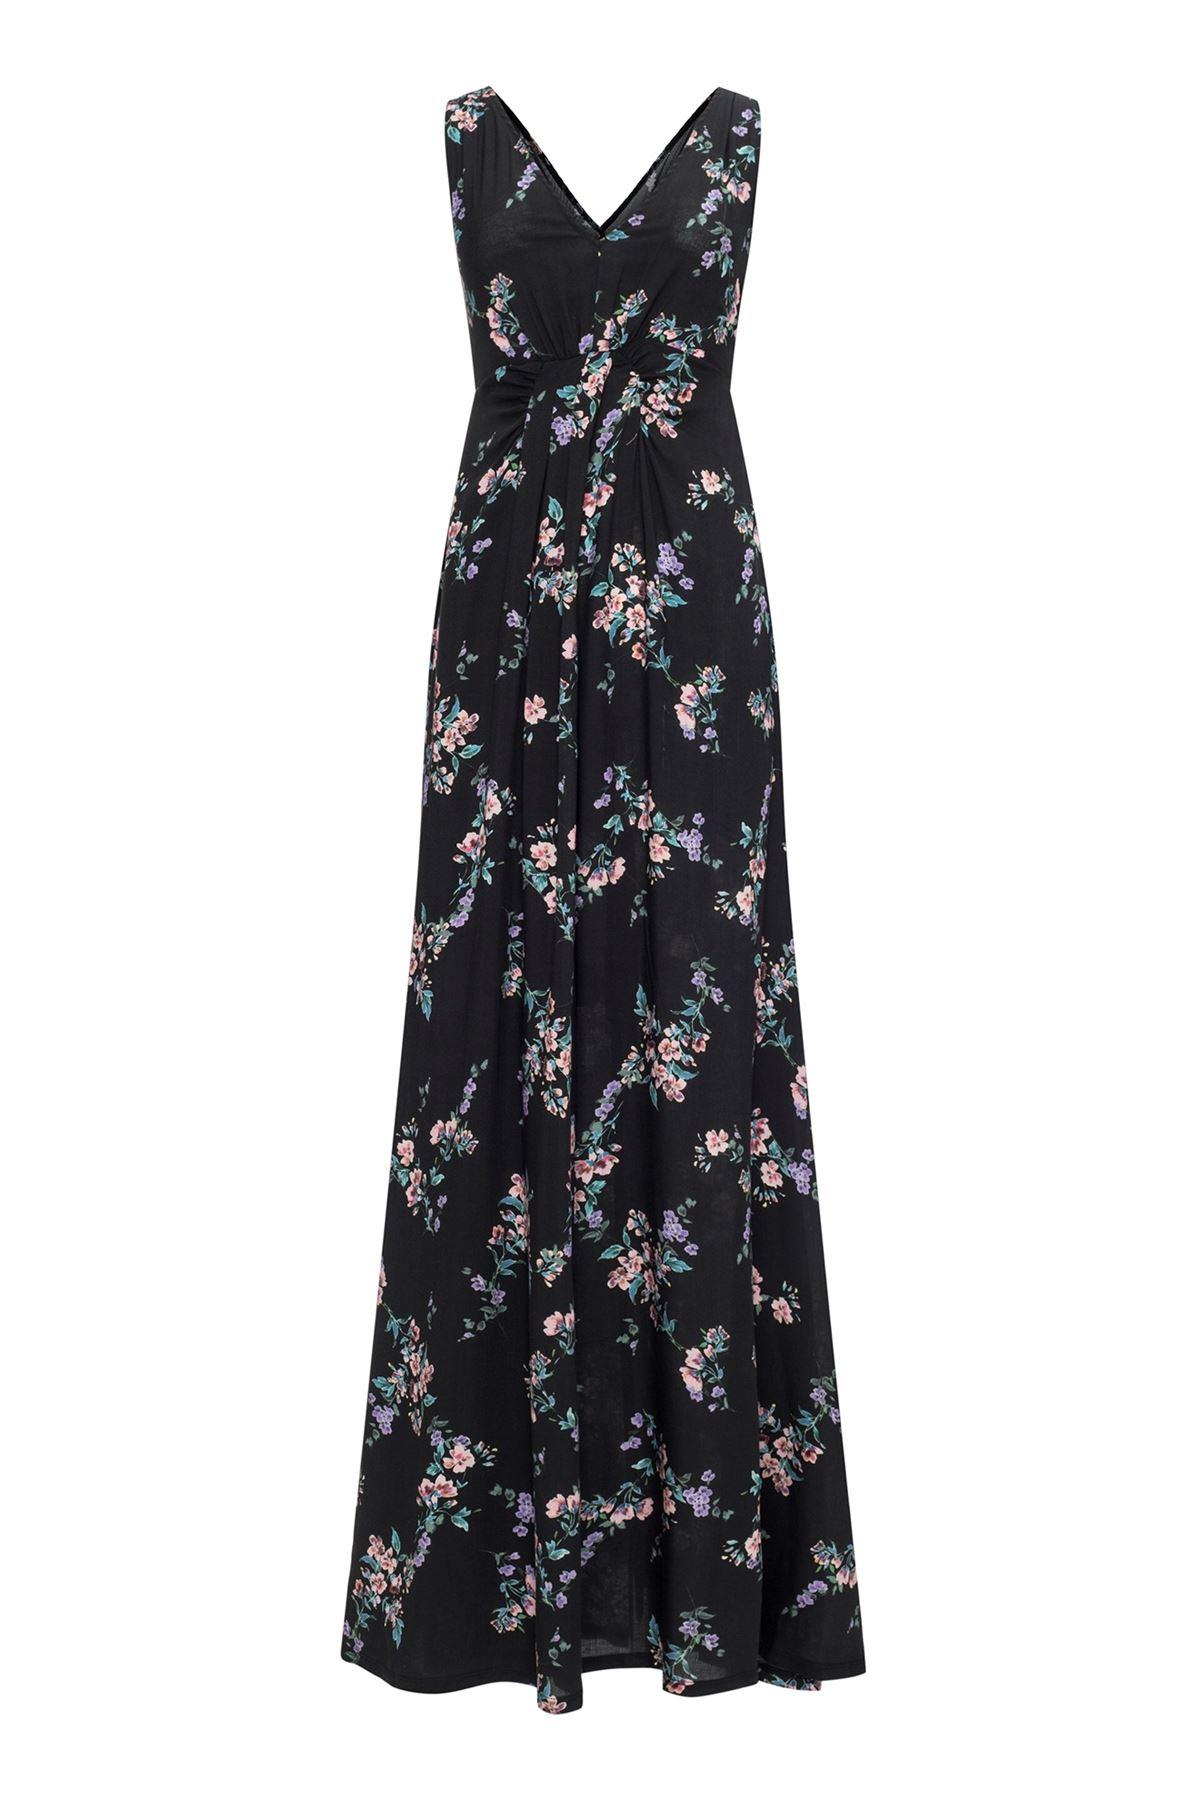 V-Neck Black Garden Maxi Dress